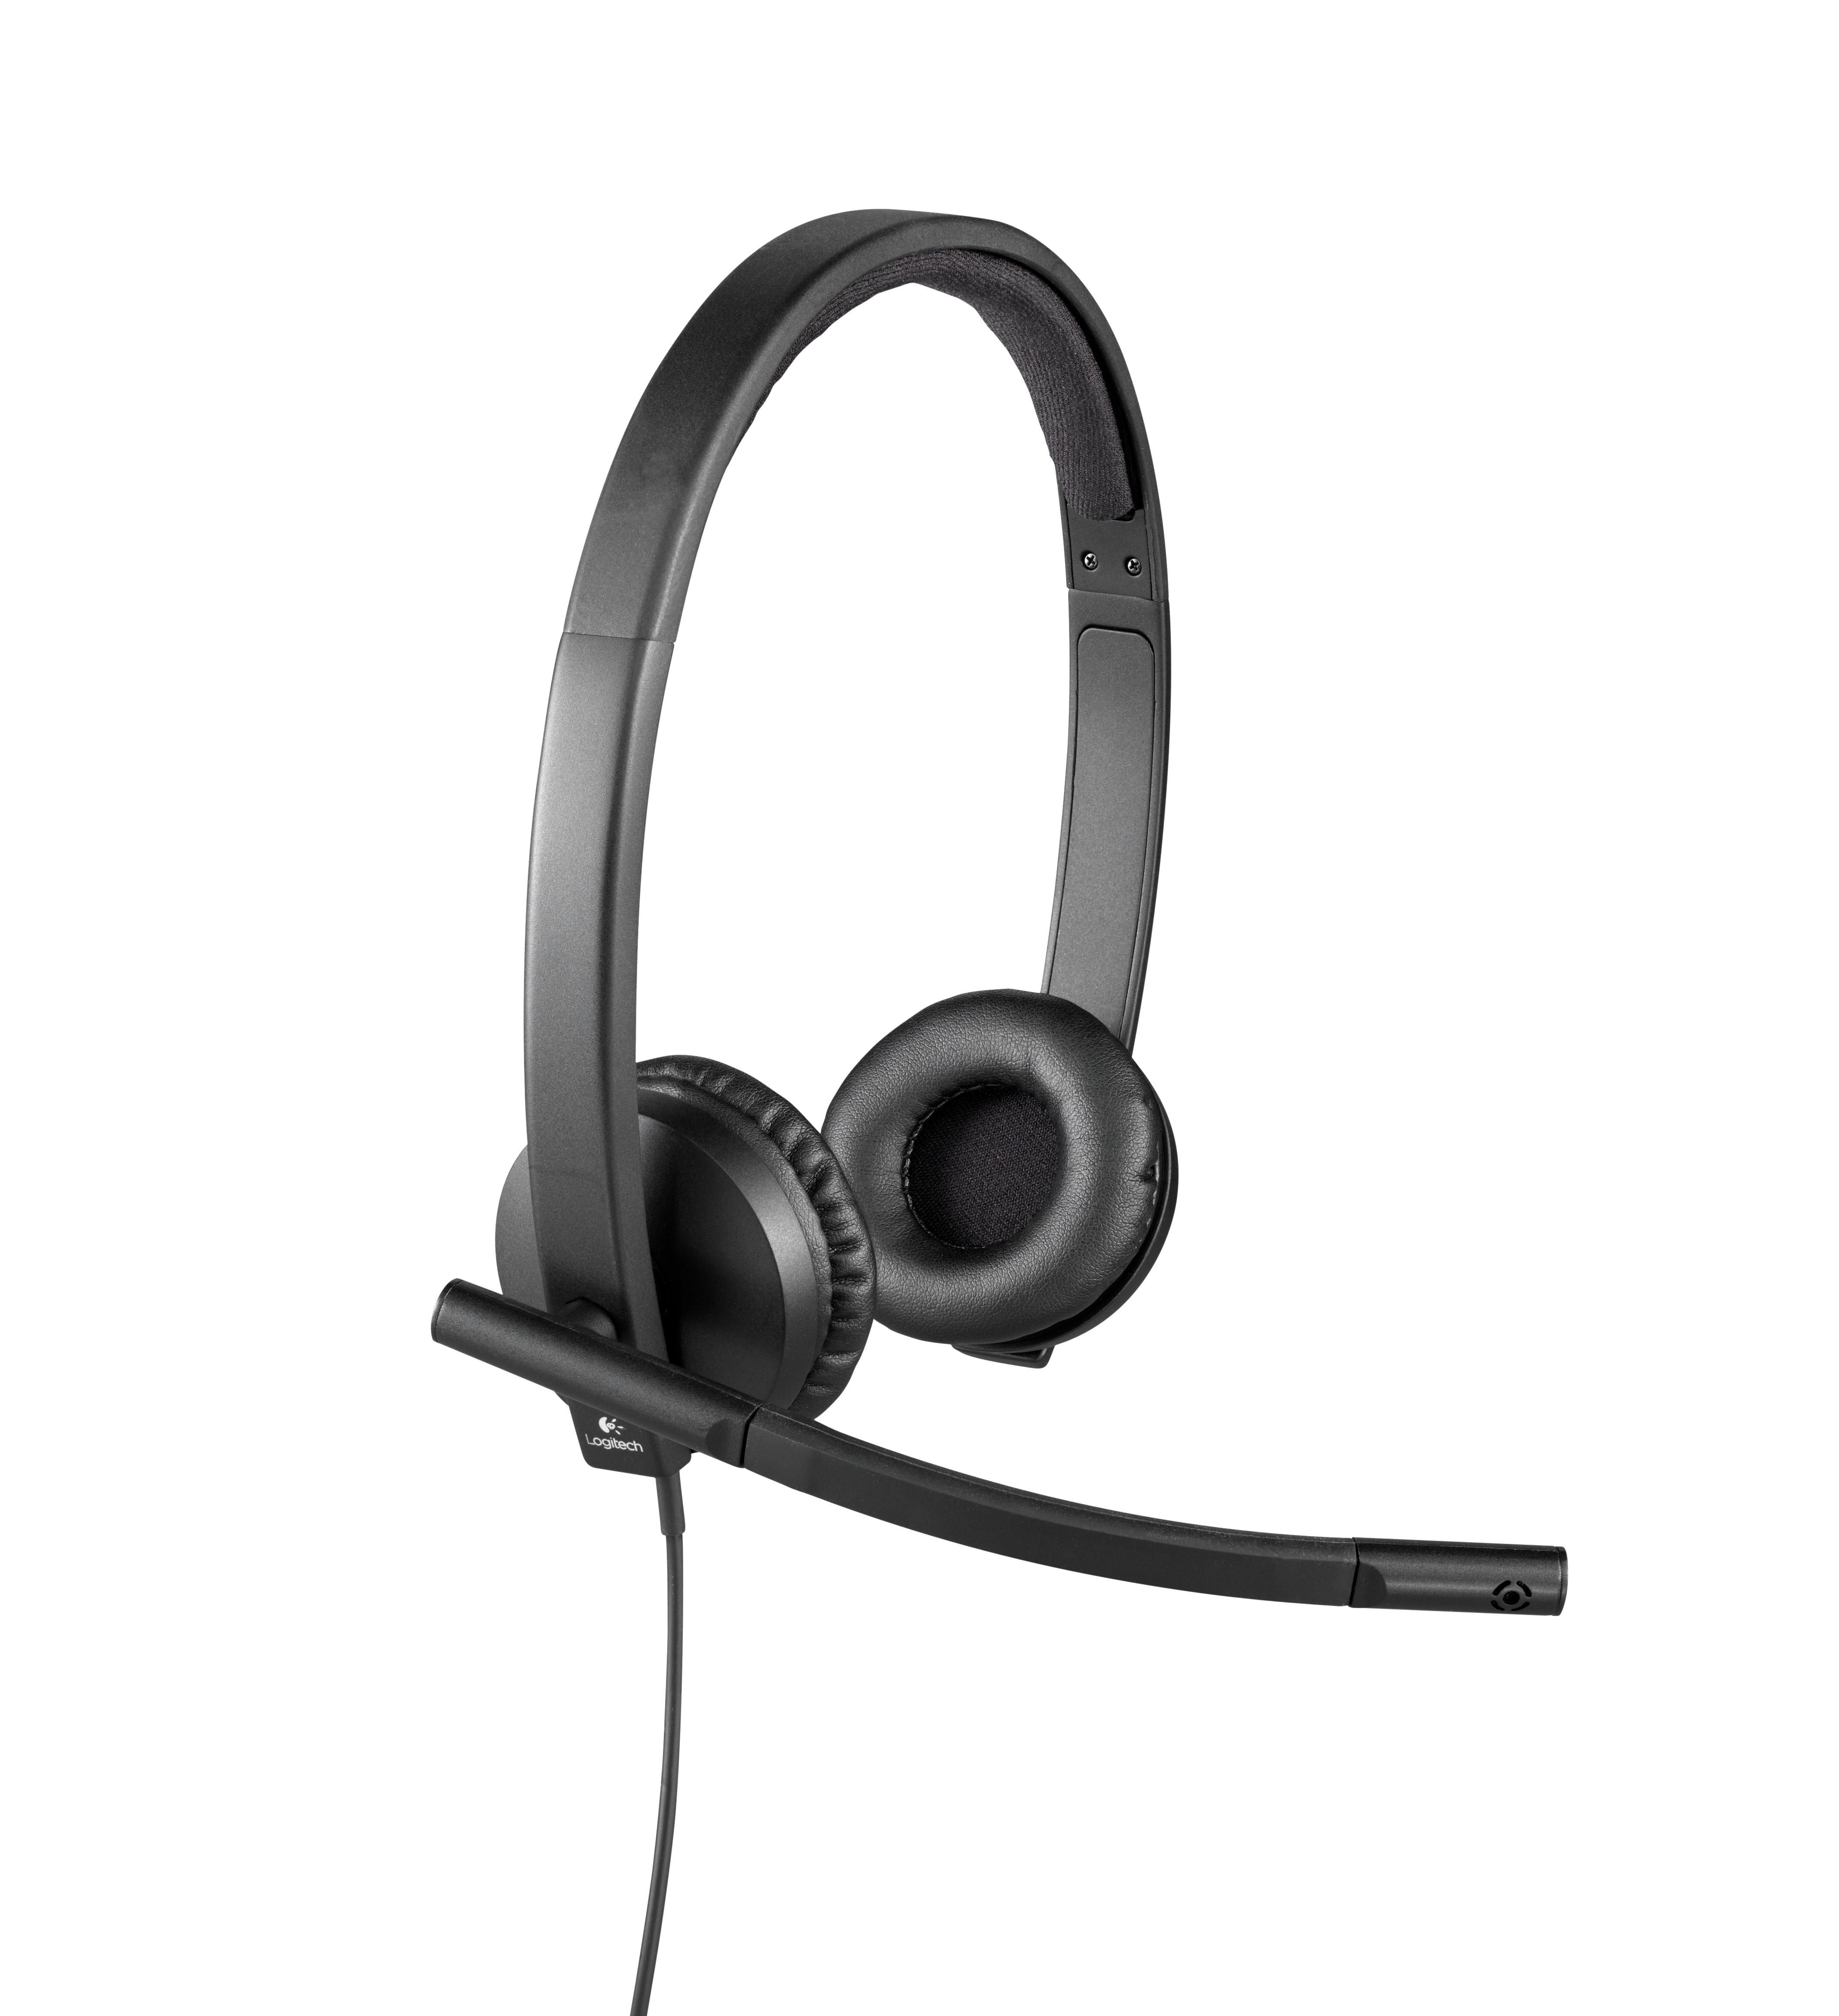 H570e Headset (stereo, on-ear, USB)